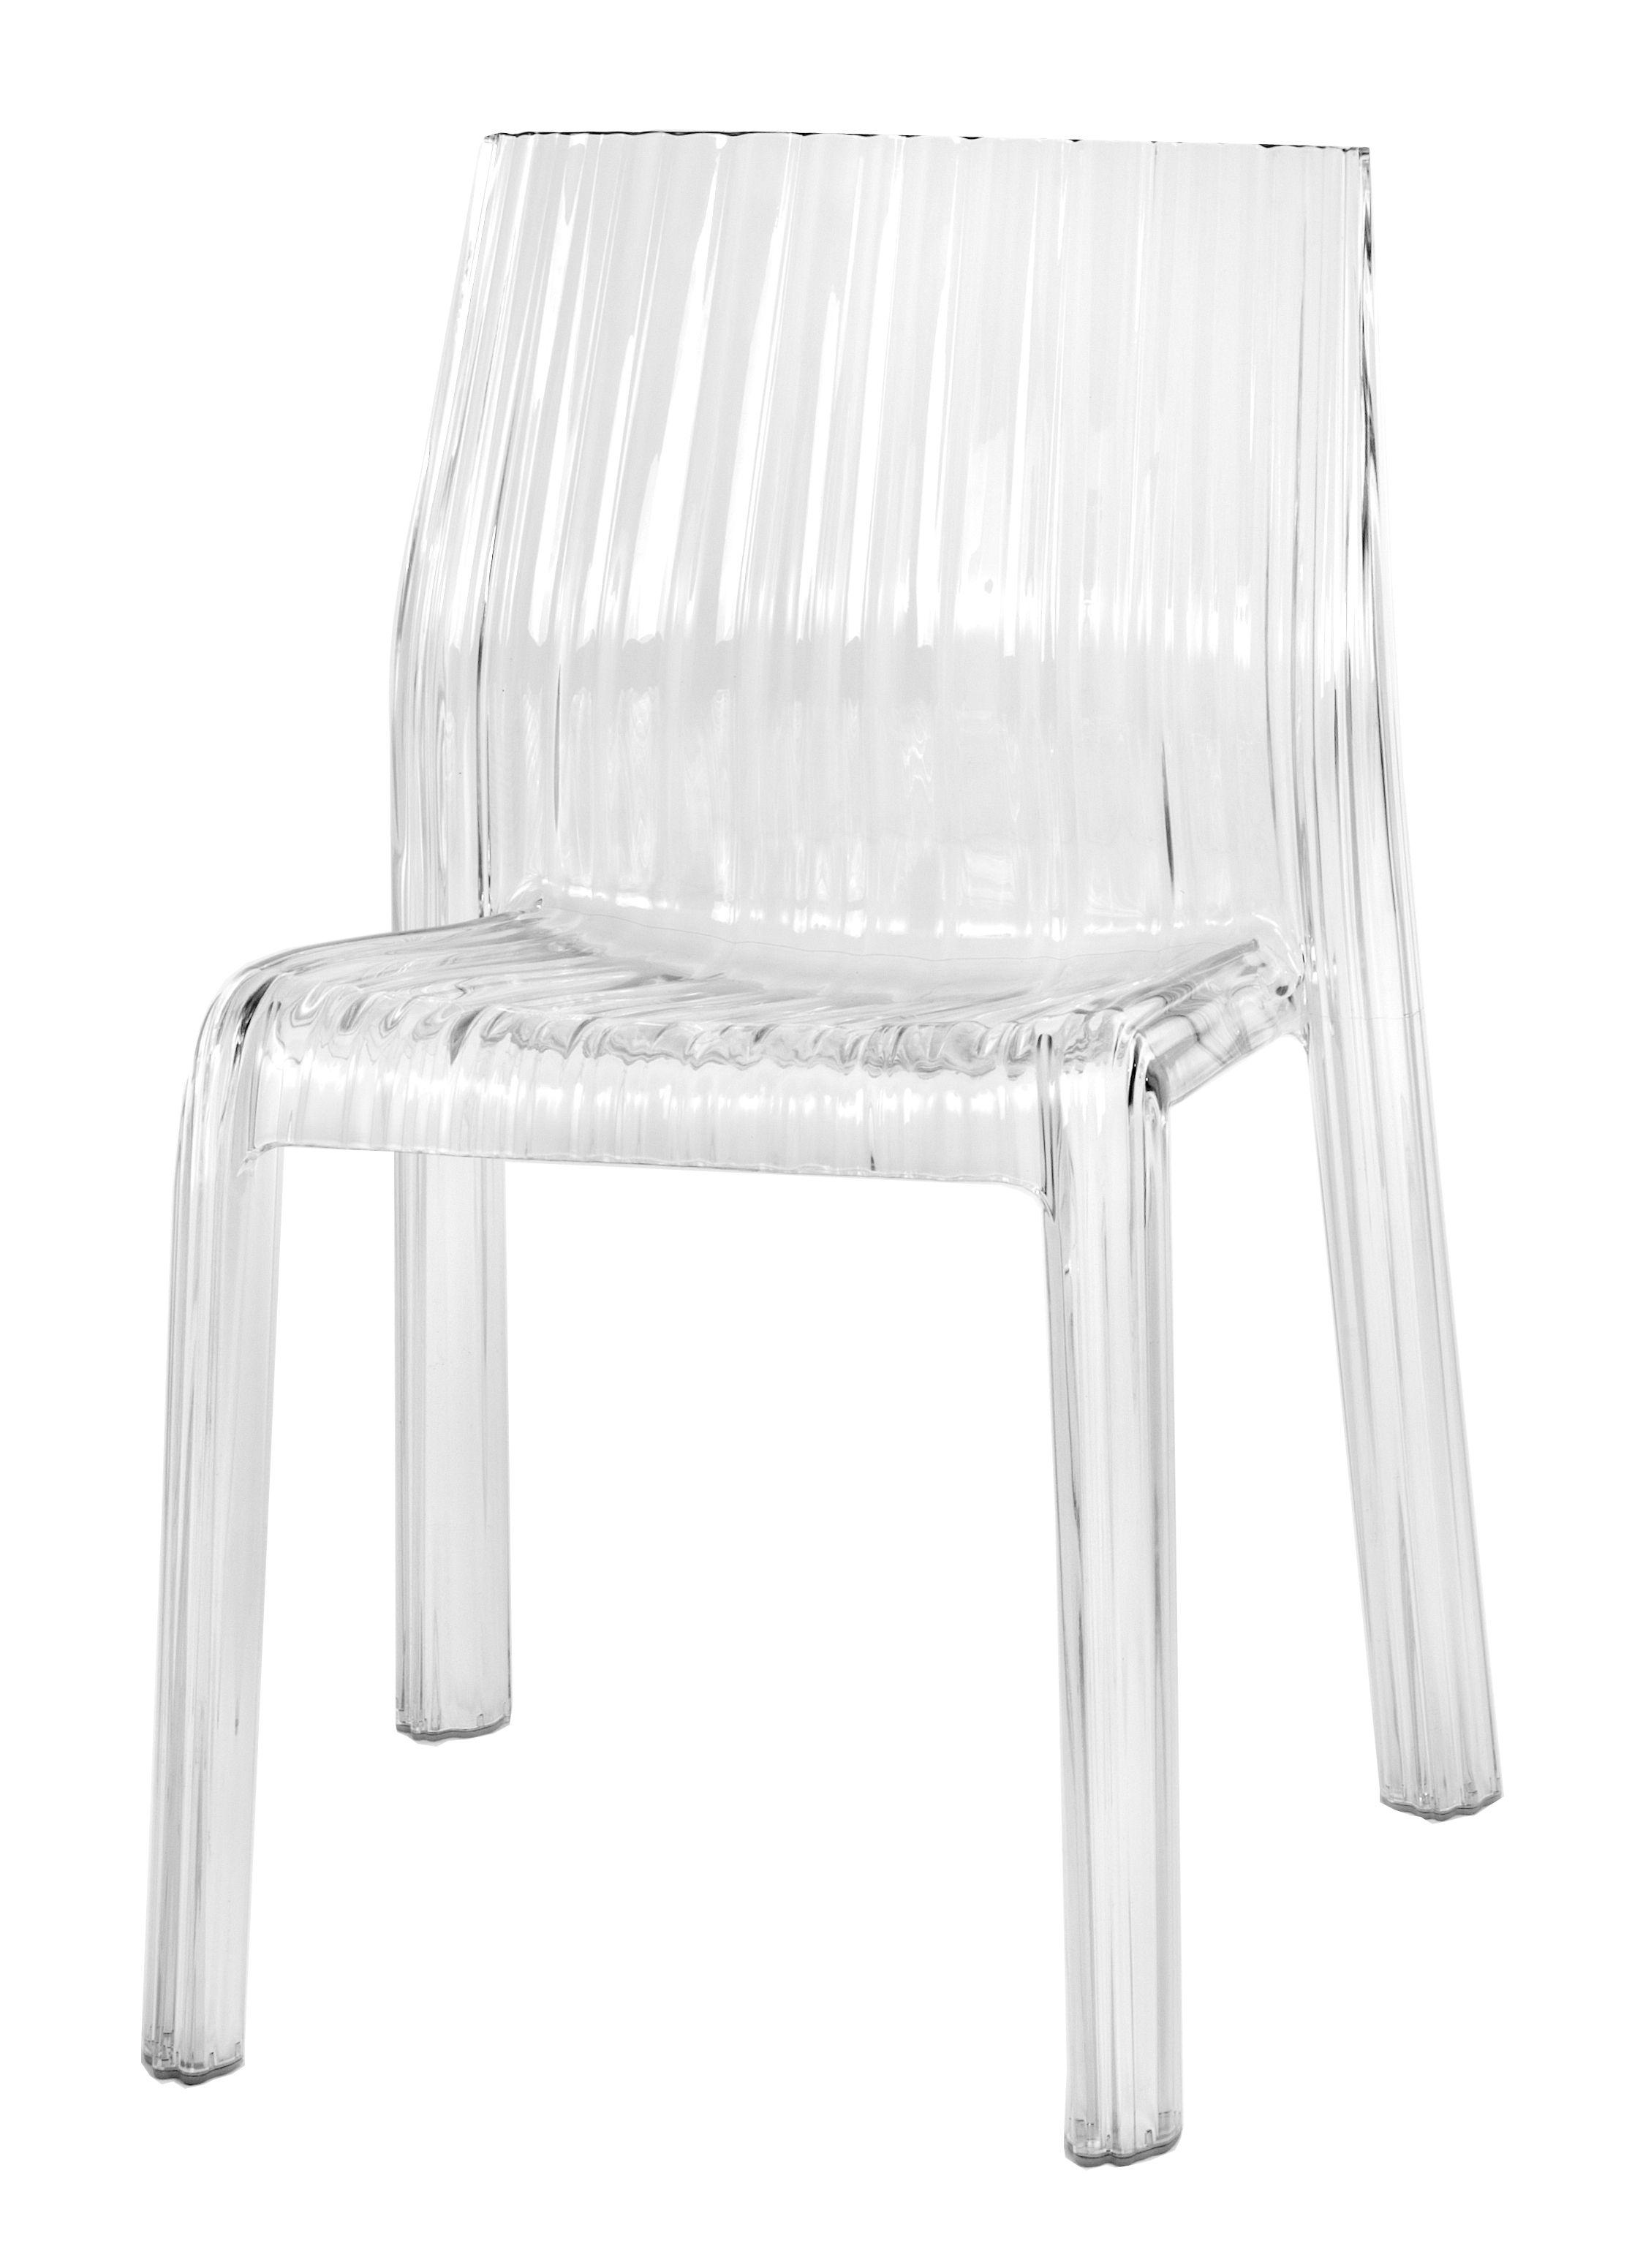 chaise empilable frilly transparente polycarbonate cristal kartell. Black Bedroom Furniture Sets. Home Design Ideas